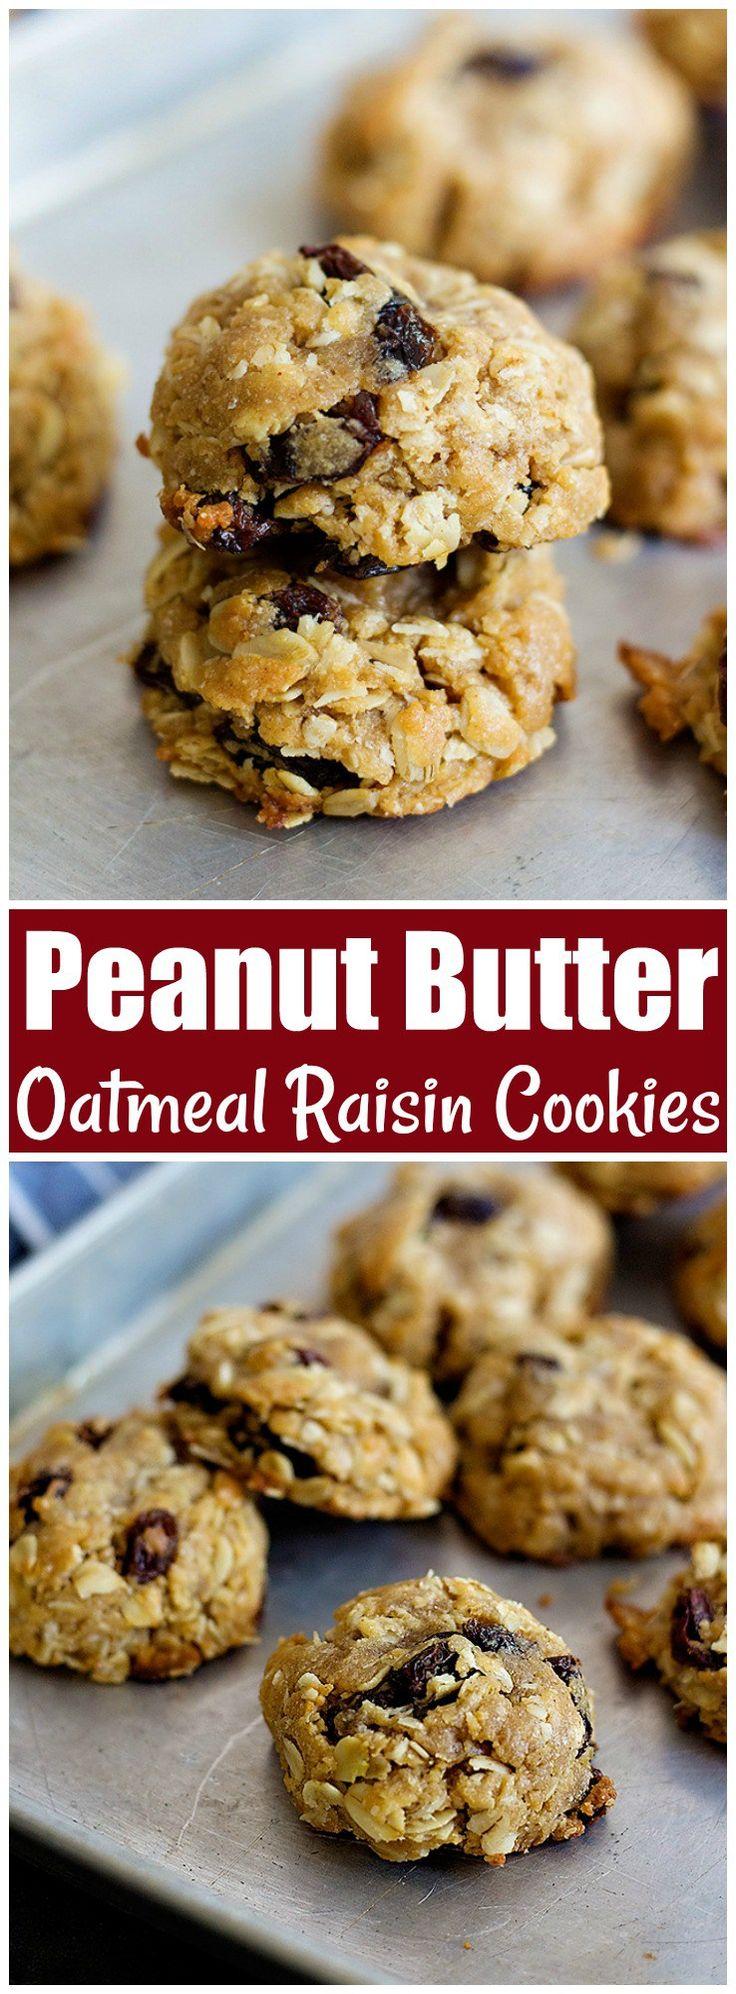 Peanut Butter Oatmeal Raisin Cookies | Peanut butter cookies | Oatmeal Raisin Cookies | Peanut Butter Oatmeal Cookies | #ChristmasCookies #ChristmasBaking #CookieRecipe